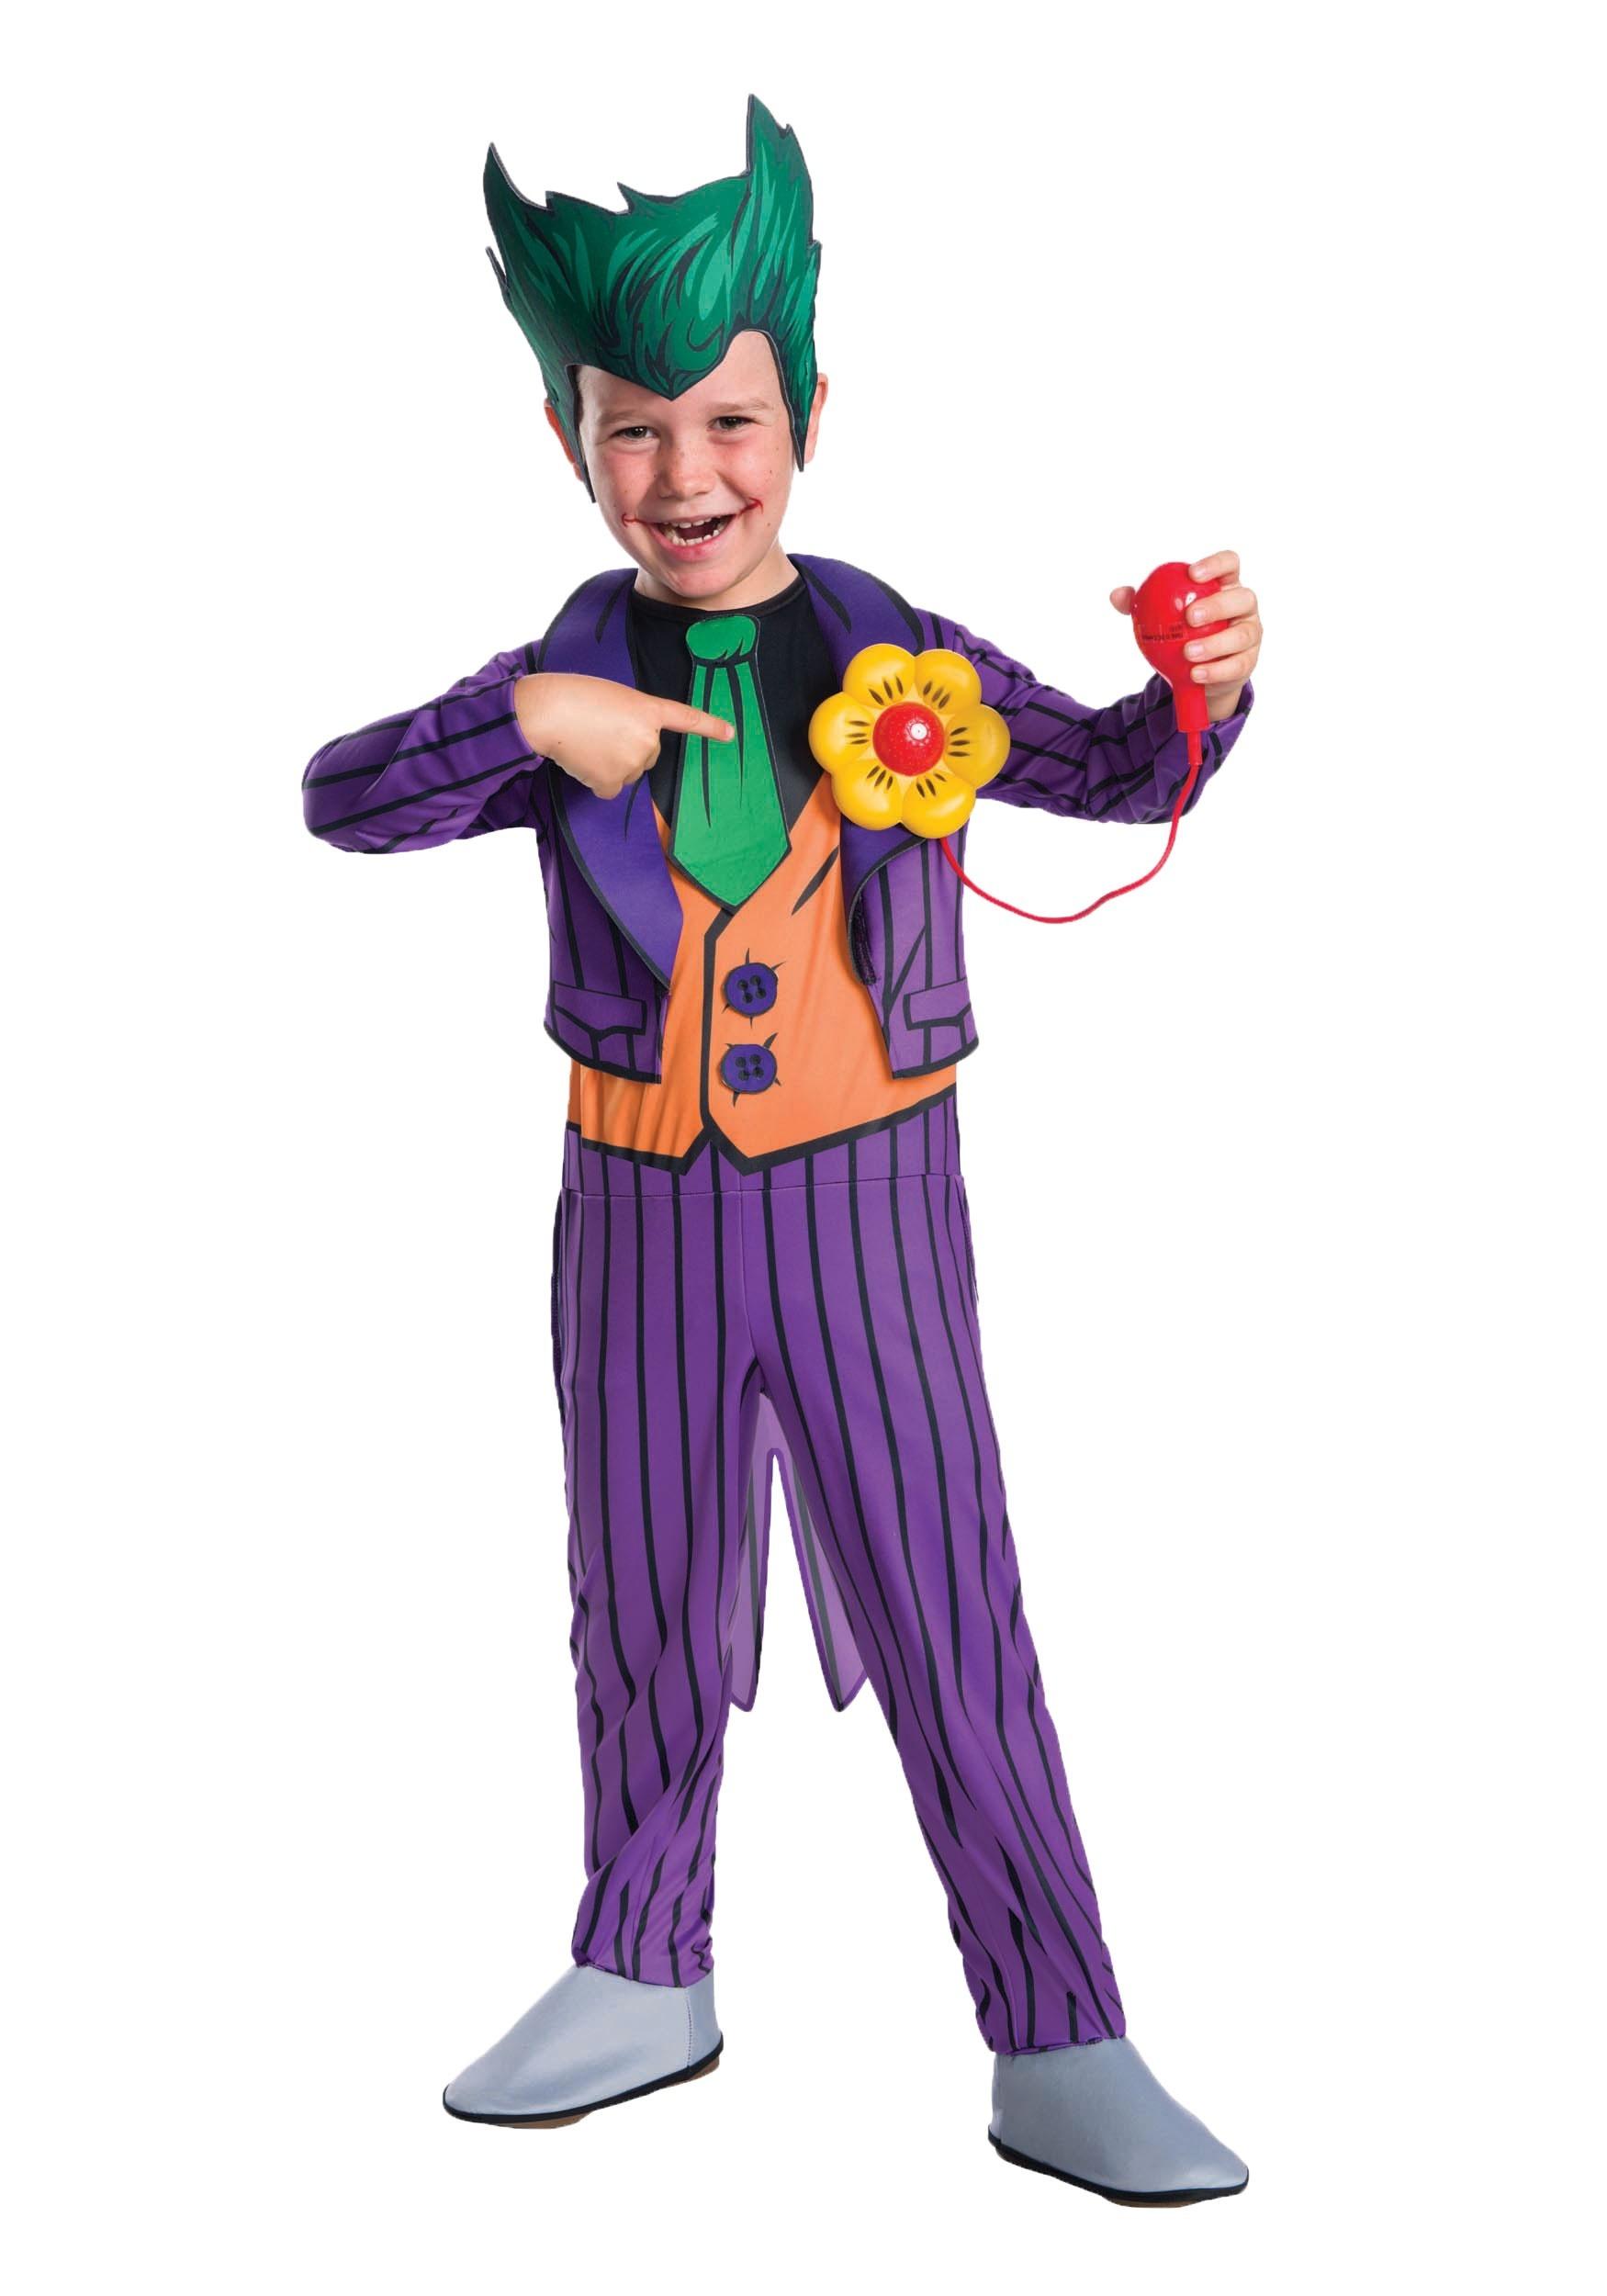 sc 1 st  The Personal Loan & Superhero Villain Halloween Costume